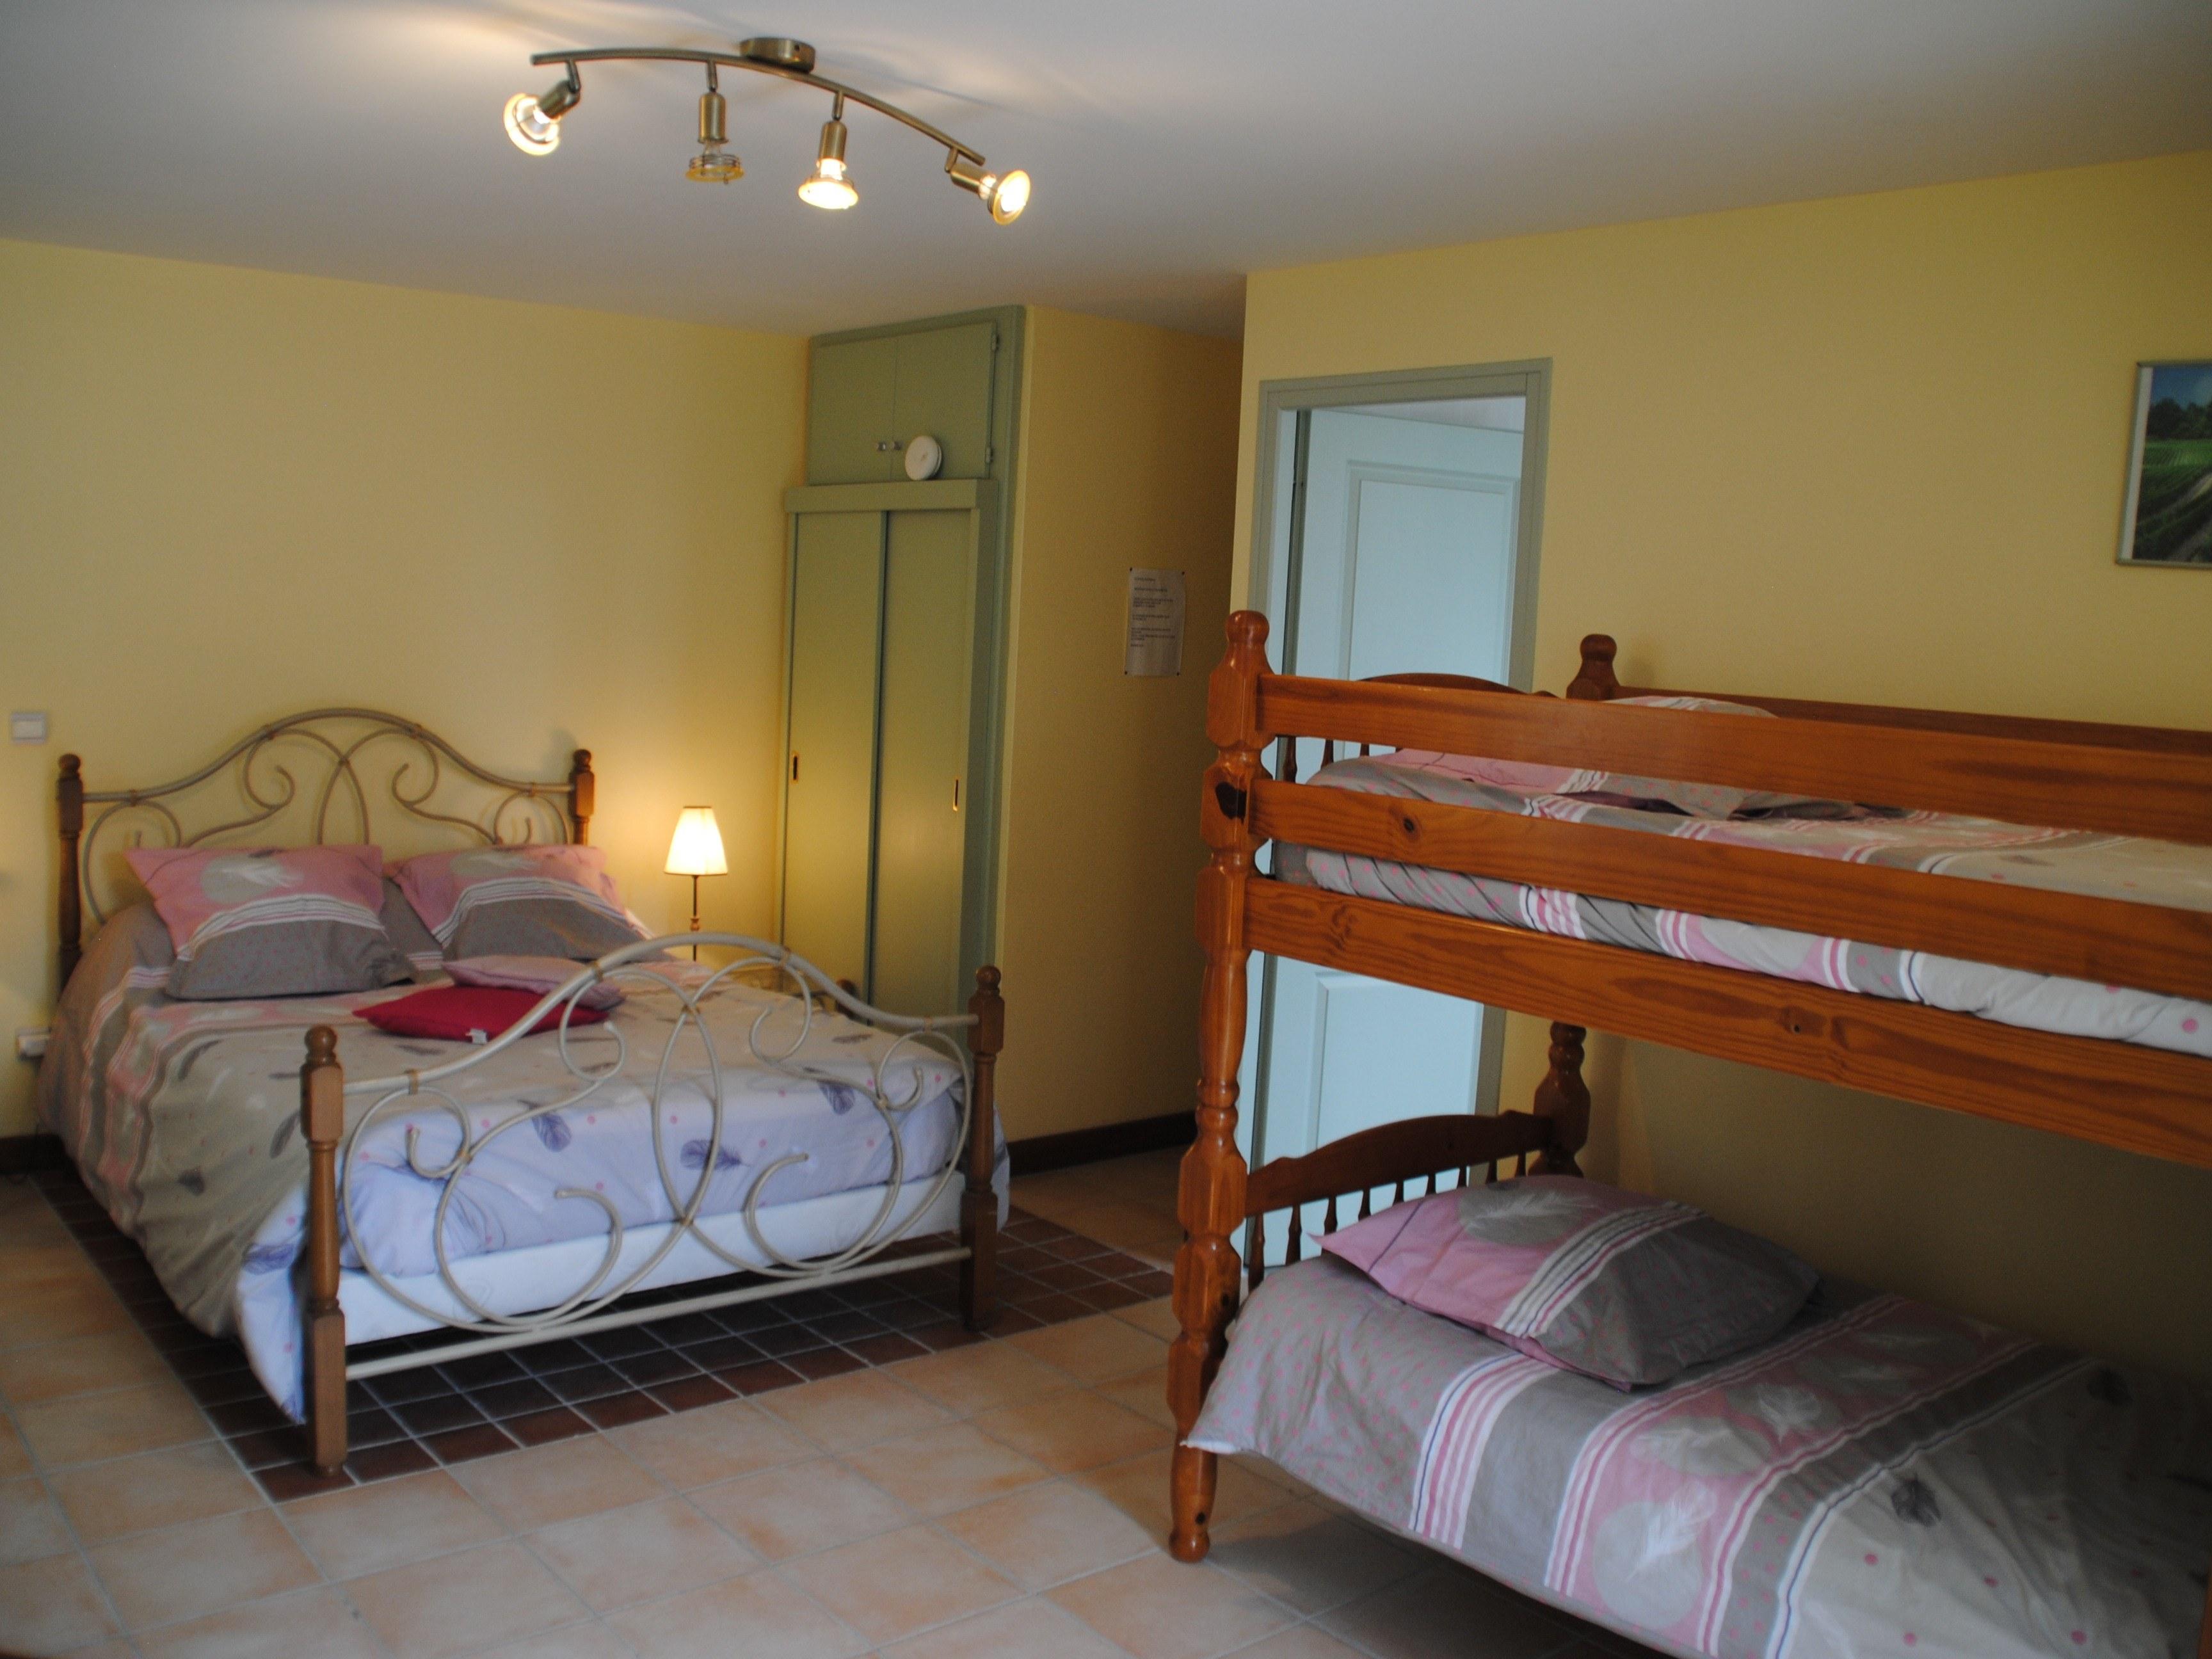 baroville-champagne-chambre-porte-lit-double-superposé